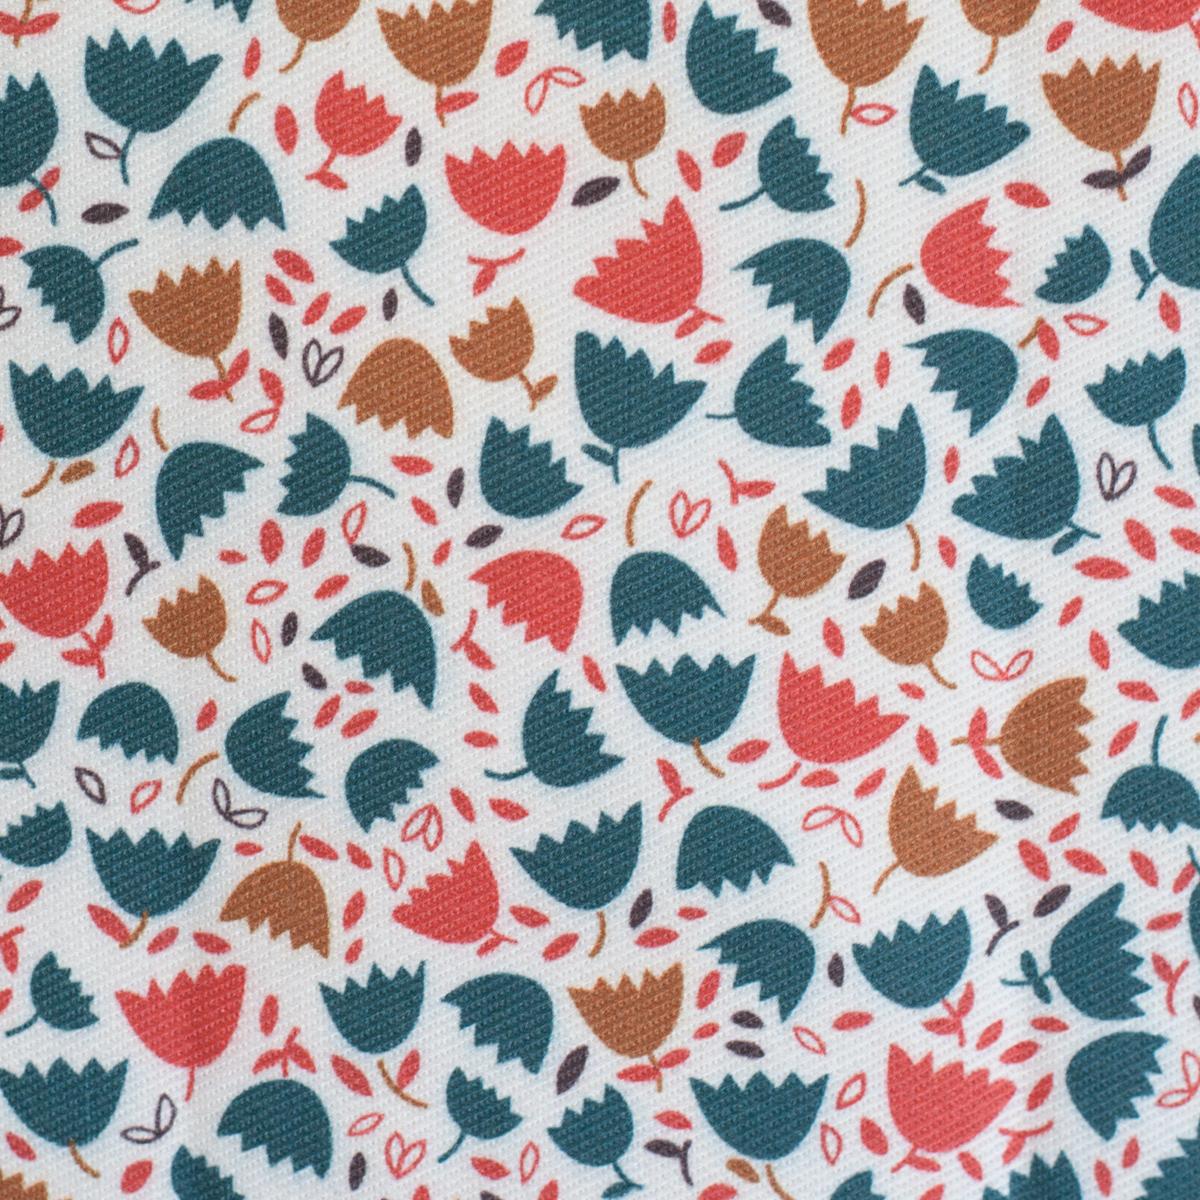 Annalisa Papagna shop - Tulli tulli tea towel detail